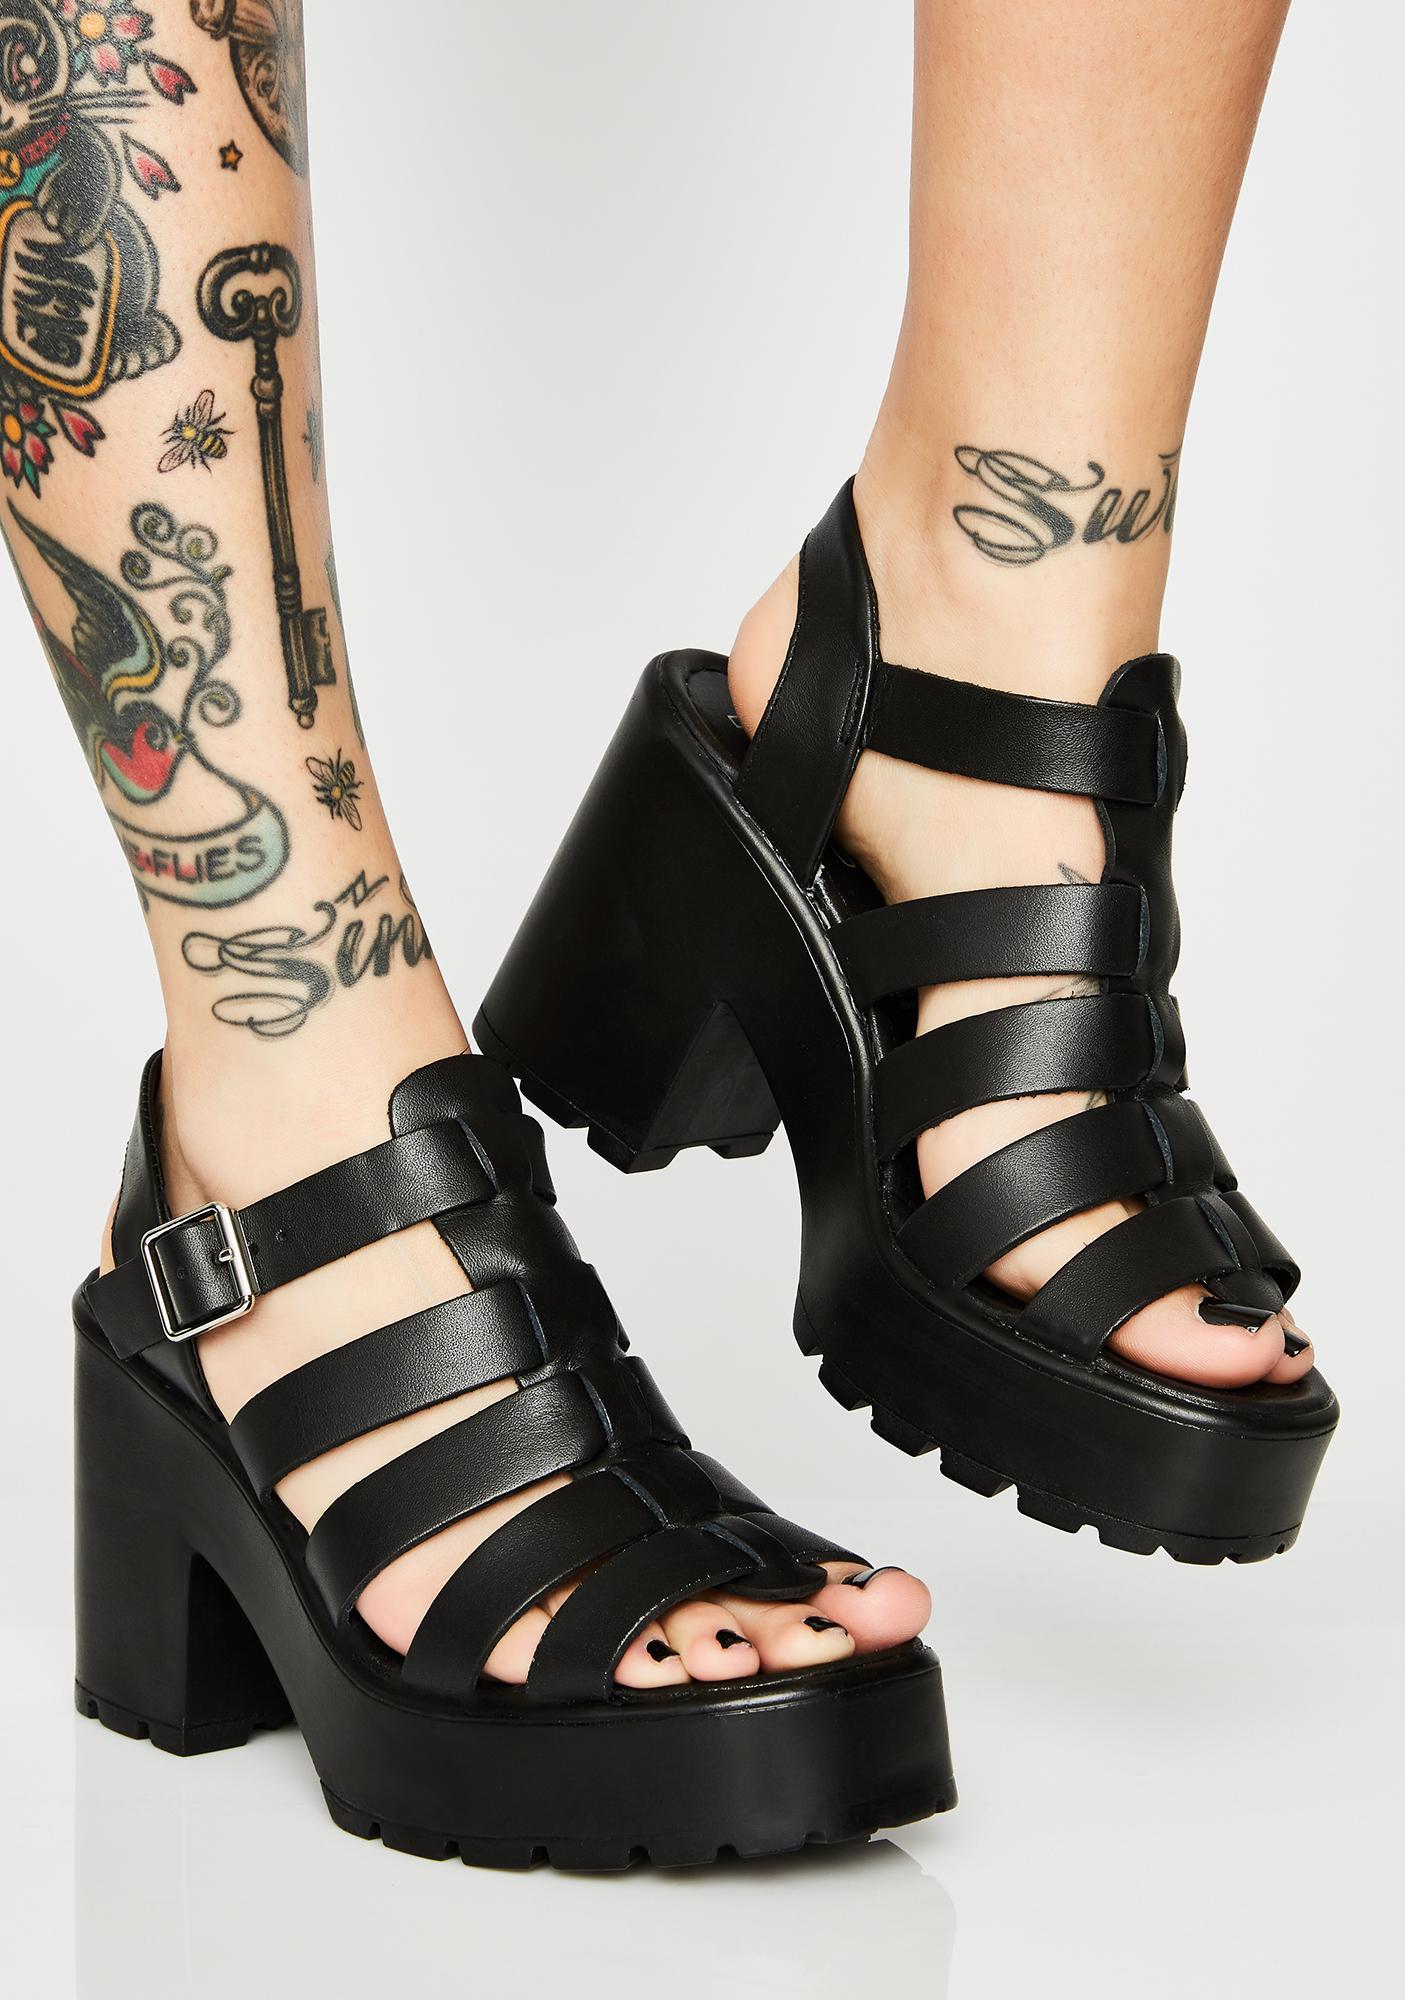 ROC Boots Australia Motto Platform Sandals